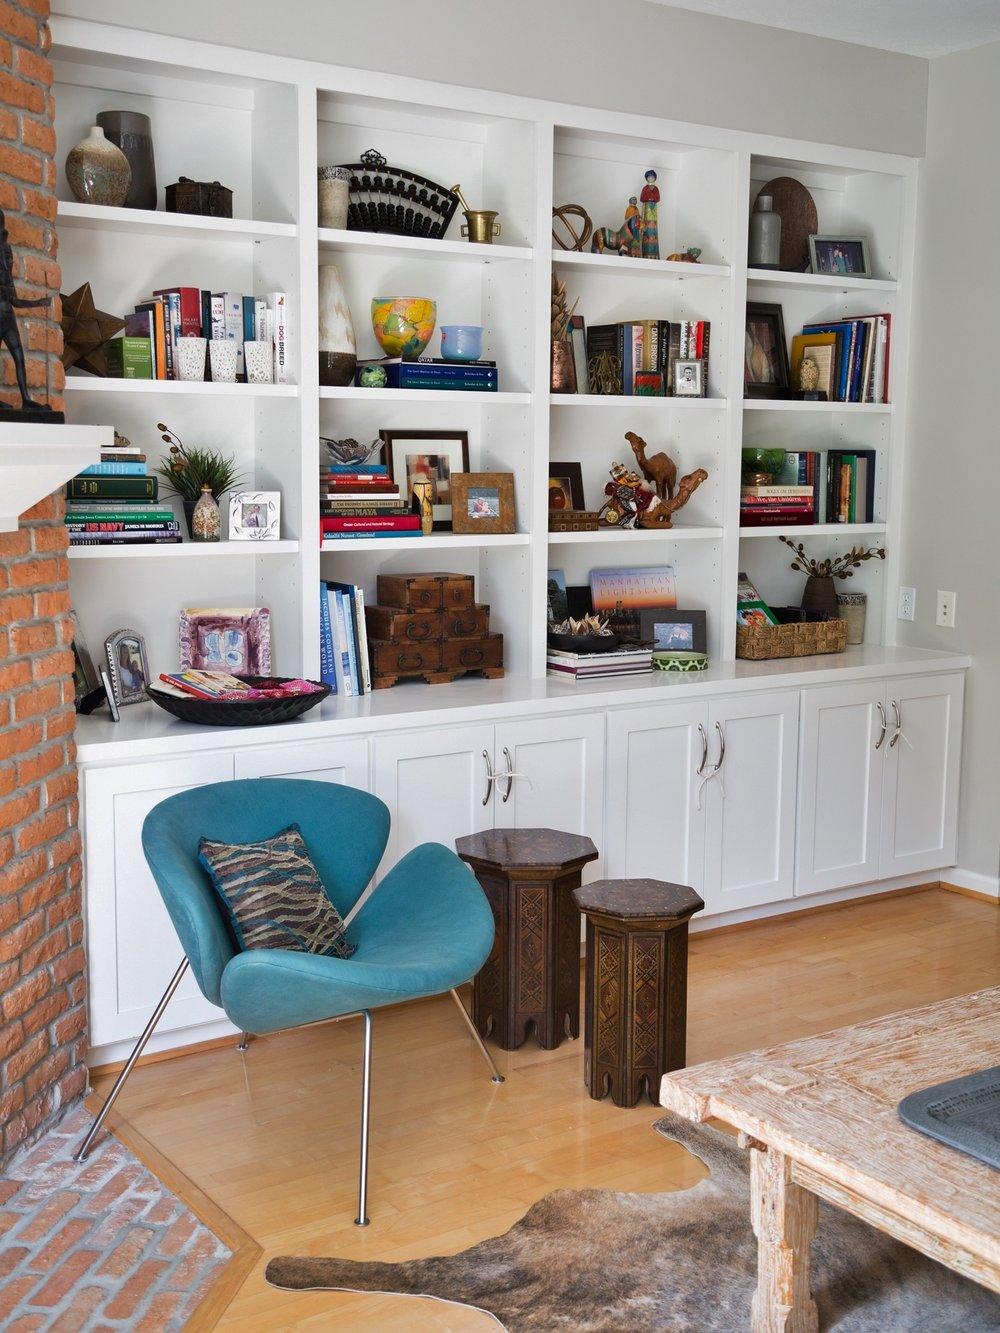 After - Bookshelf styling, Carla Aston - Designer, Tori Aston - Photographer